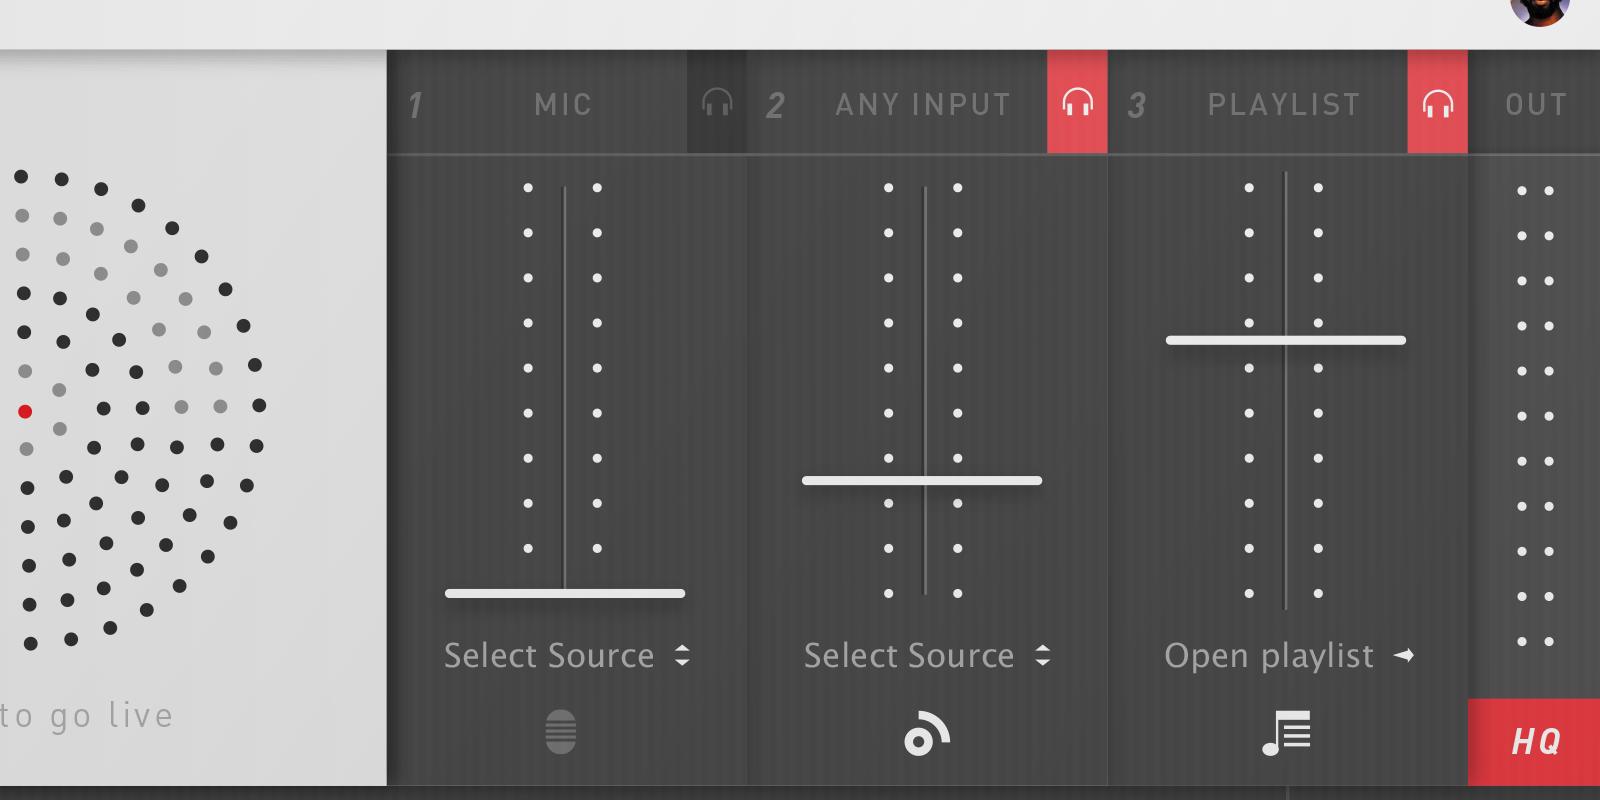 Mixlr_DesktopApp_Monitoring_PromoImage_1600x800_v2